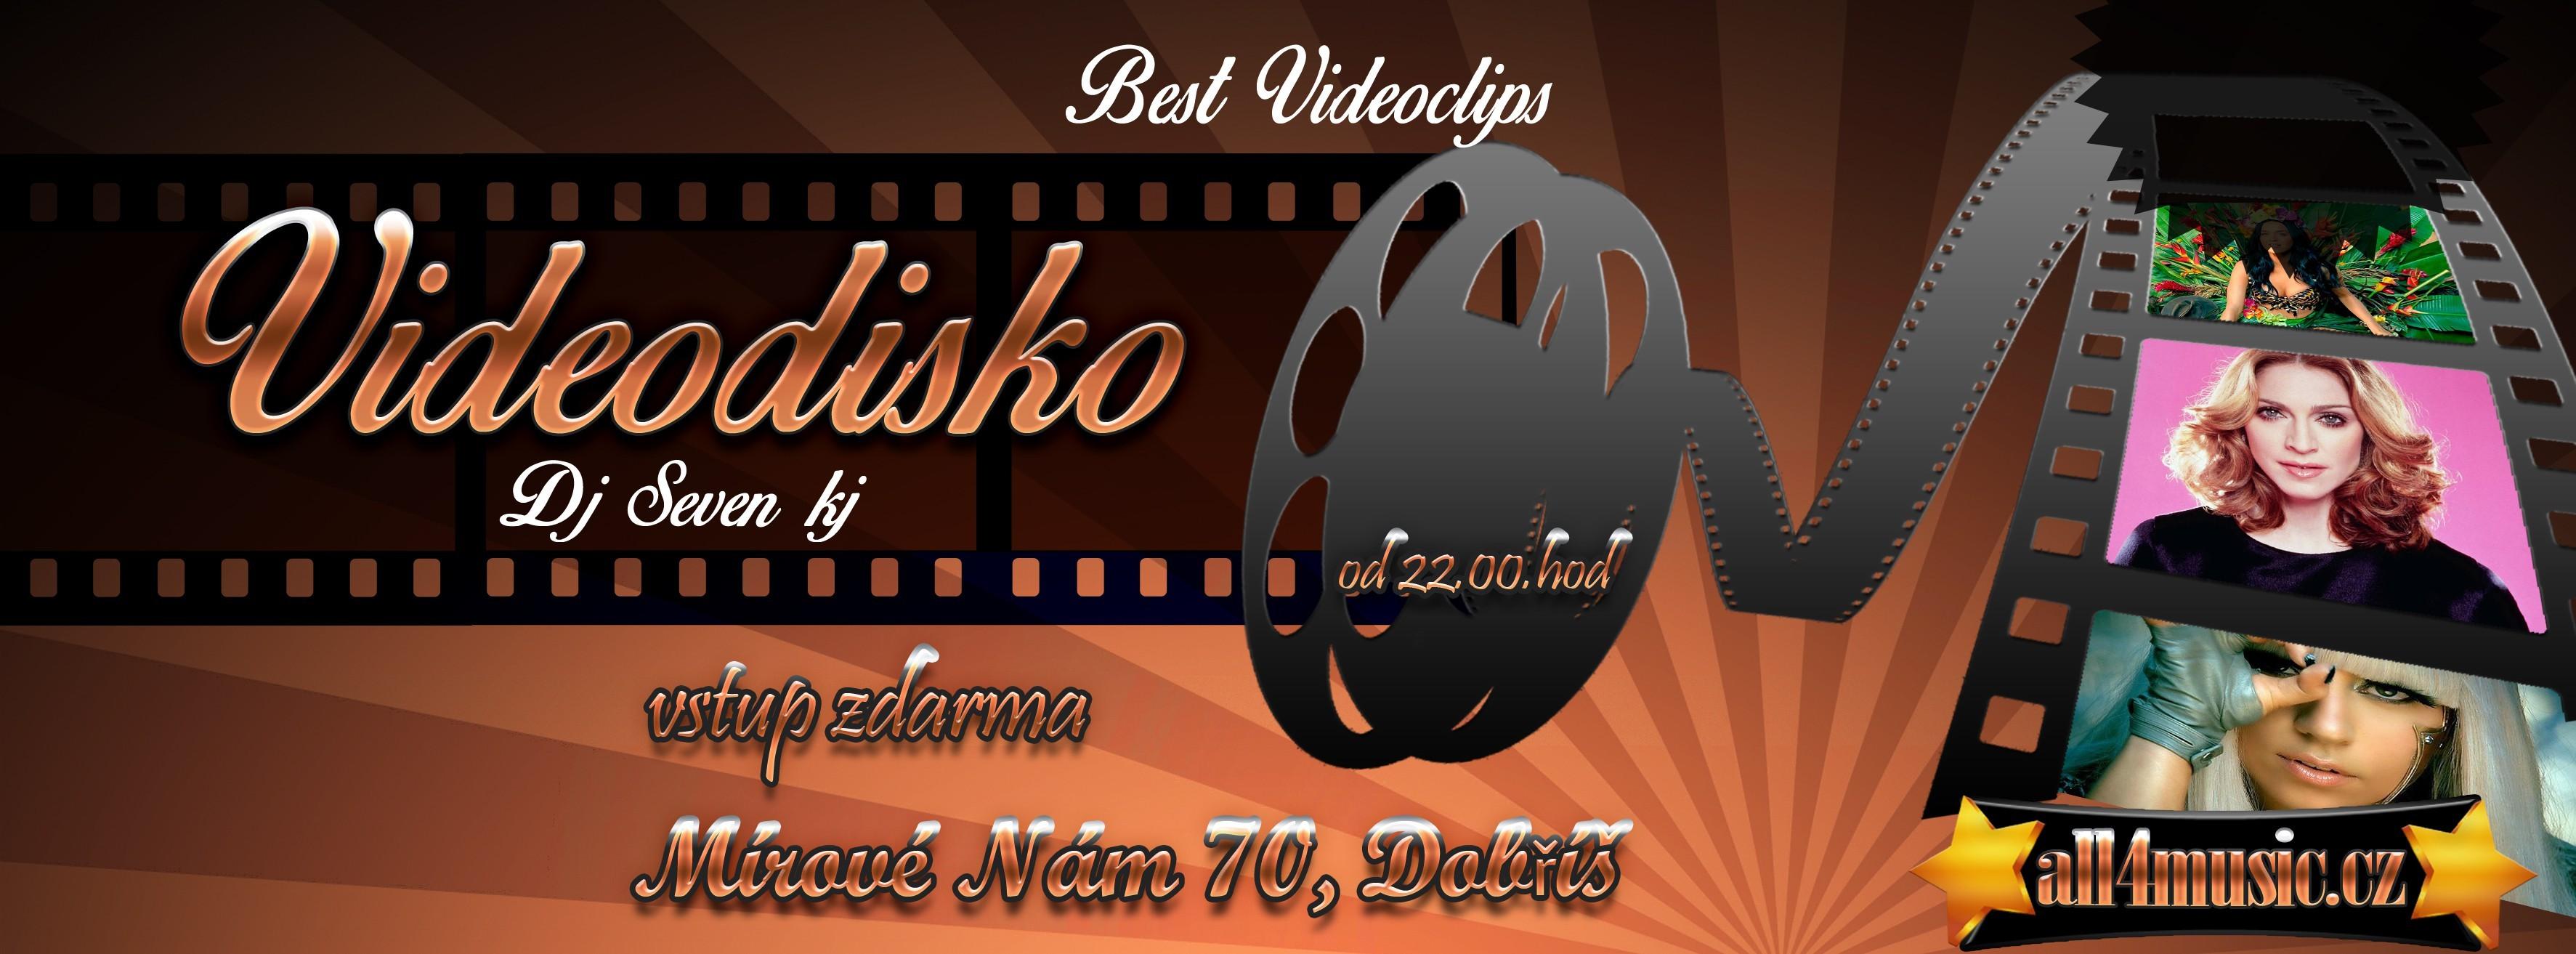 Videodisco 80s 90s dj ALL4MUSIC Praha